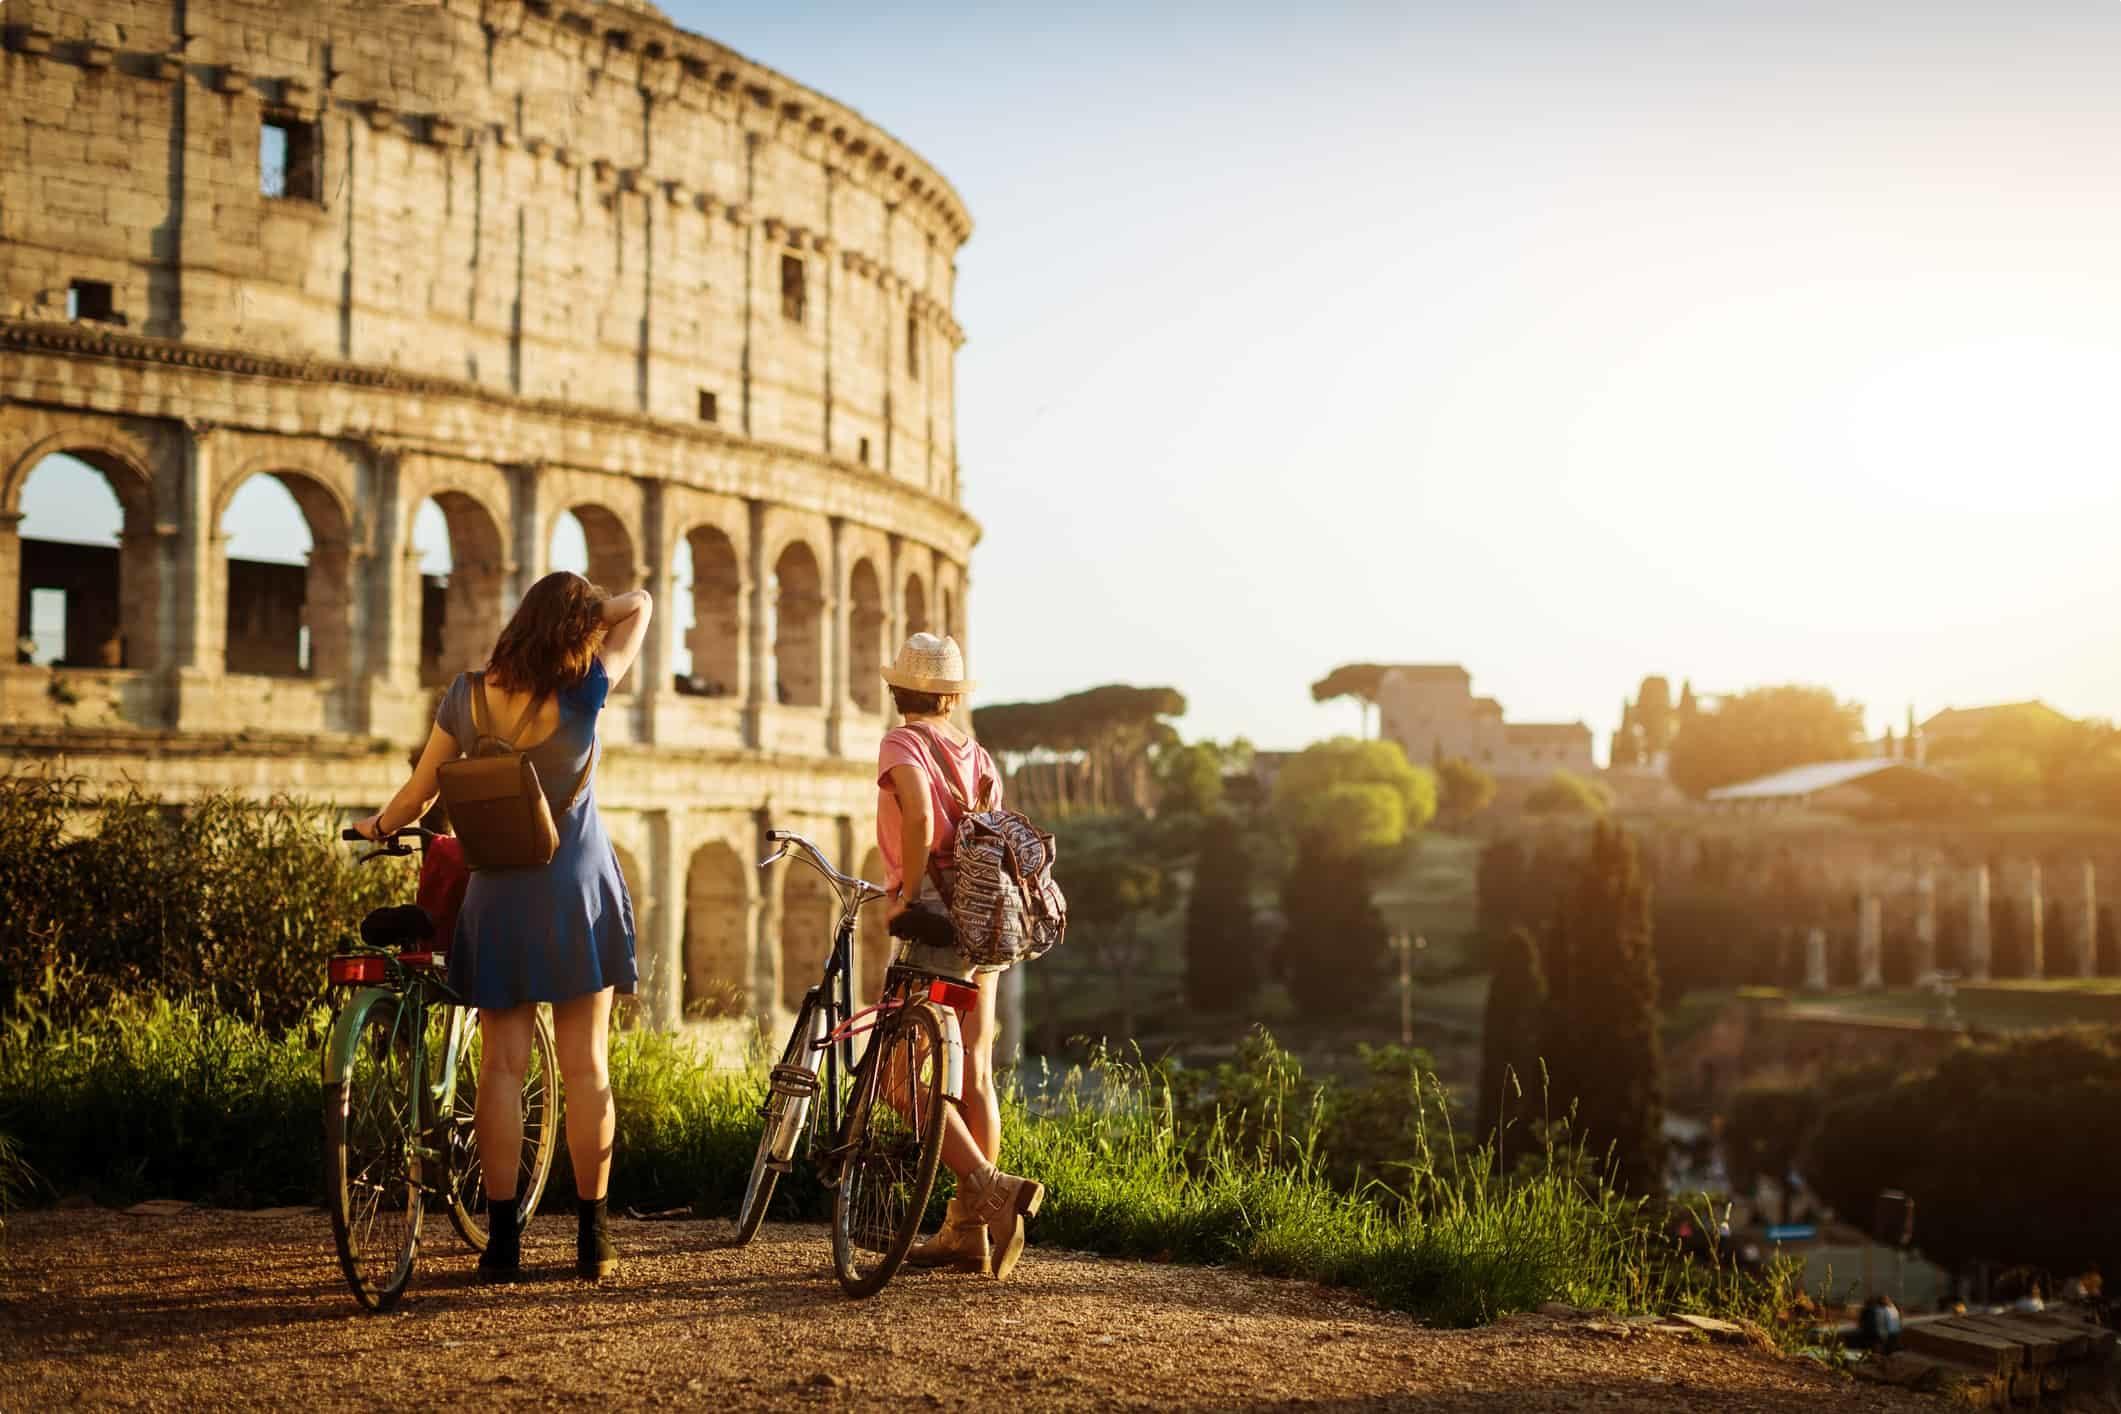 Roman Colosseum, Rome.